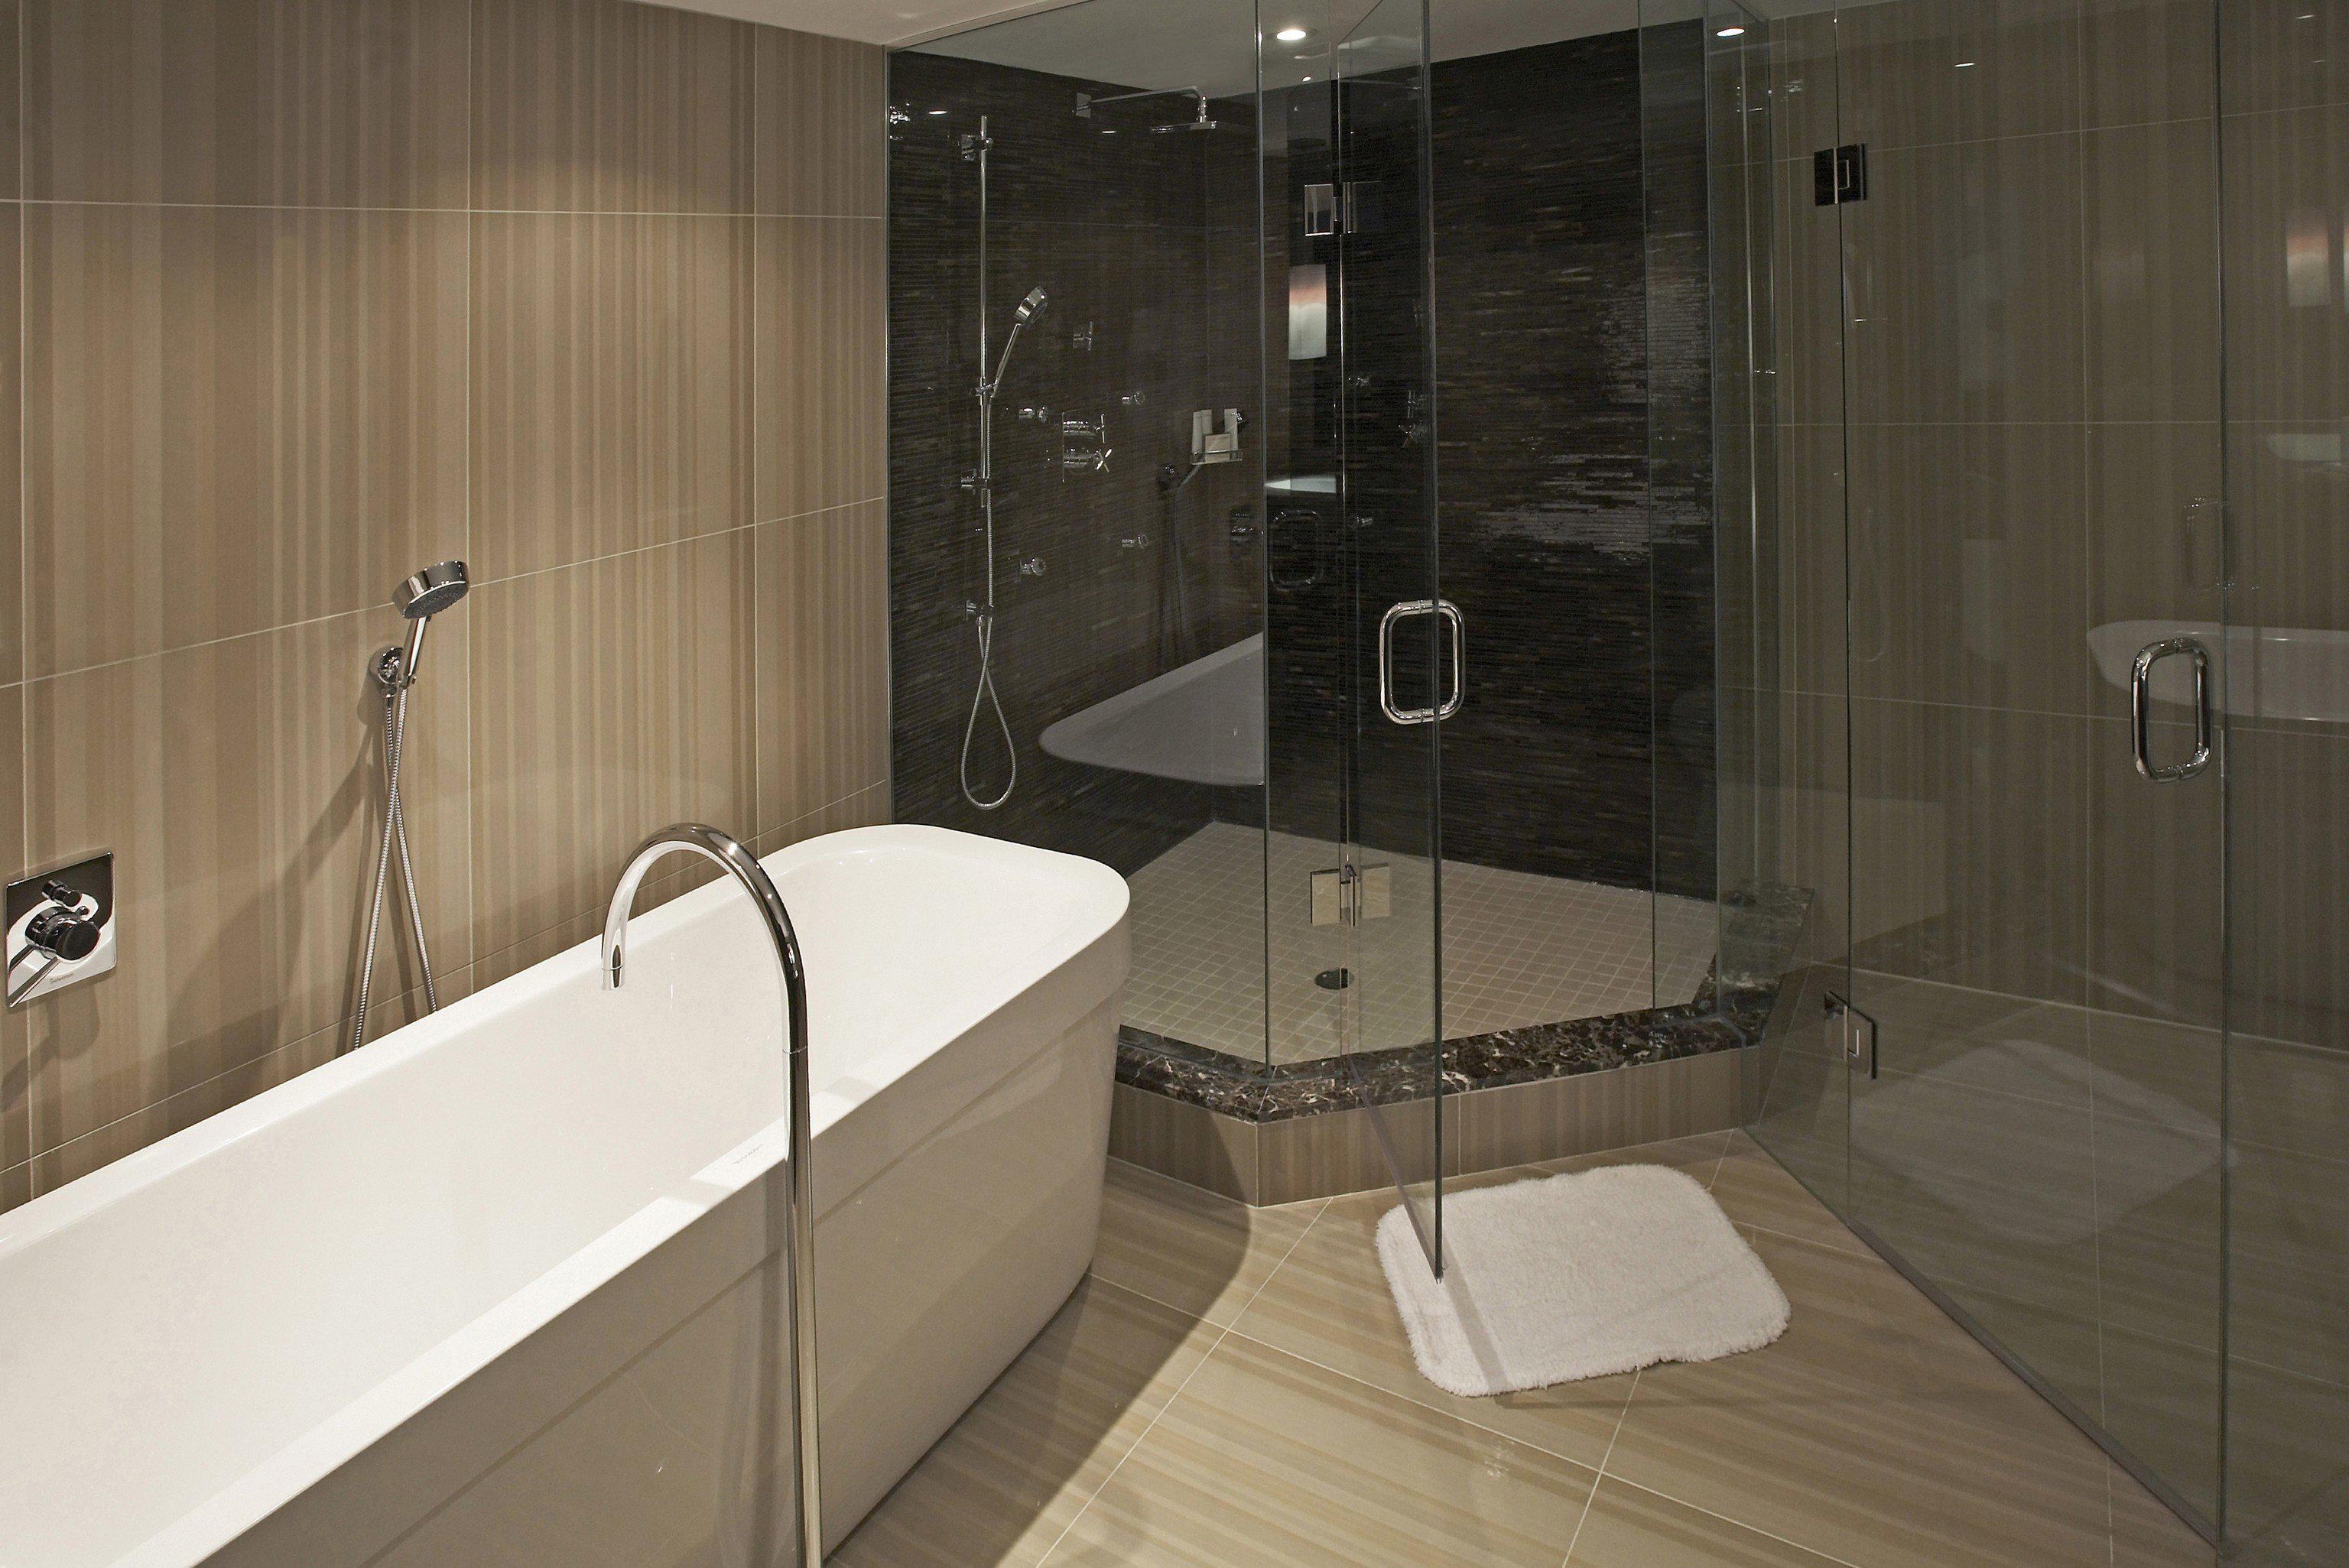 bathroom property scene bathtub plumbing fixture Suite flooring public toilet toilet tub tile tiled Bath